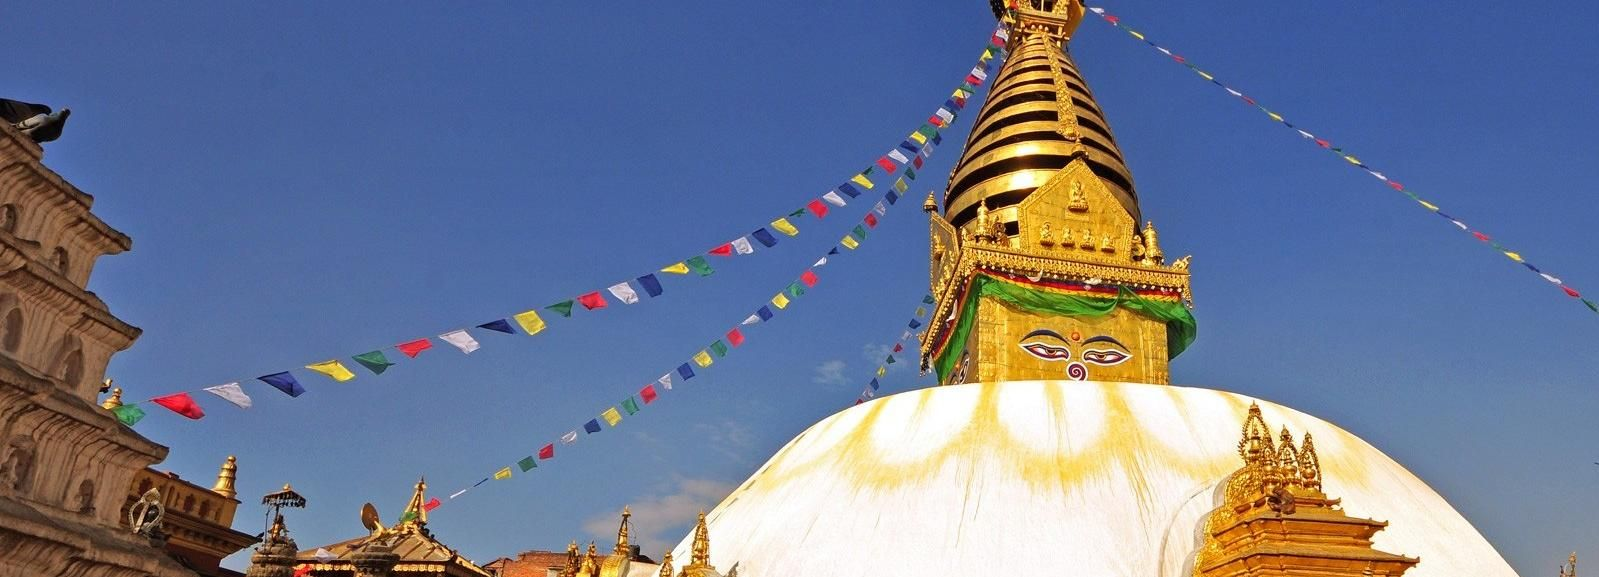 Kathmandu: Full-Day Guided Sightseeing Tour